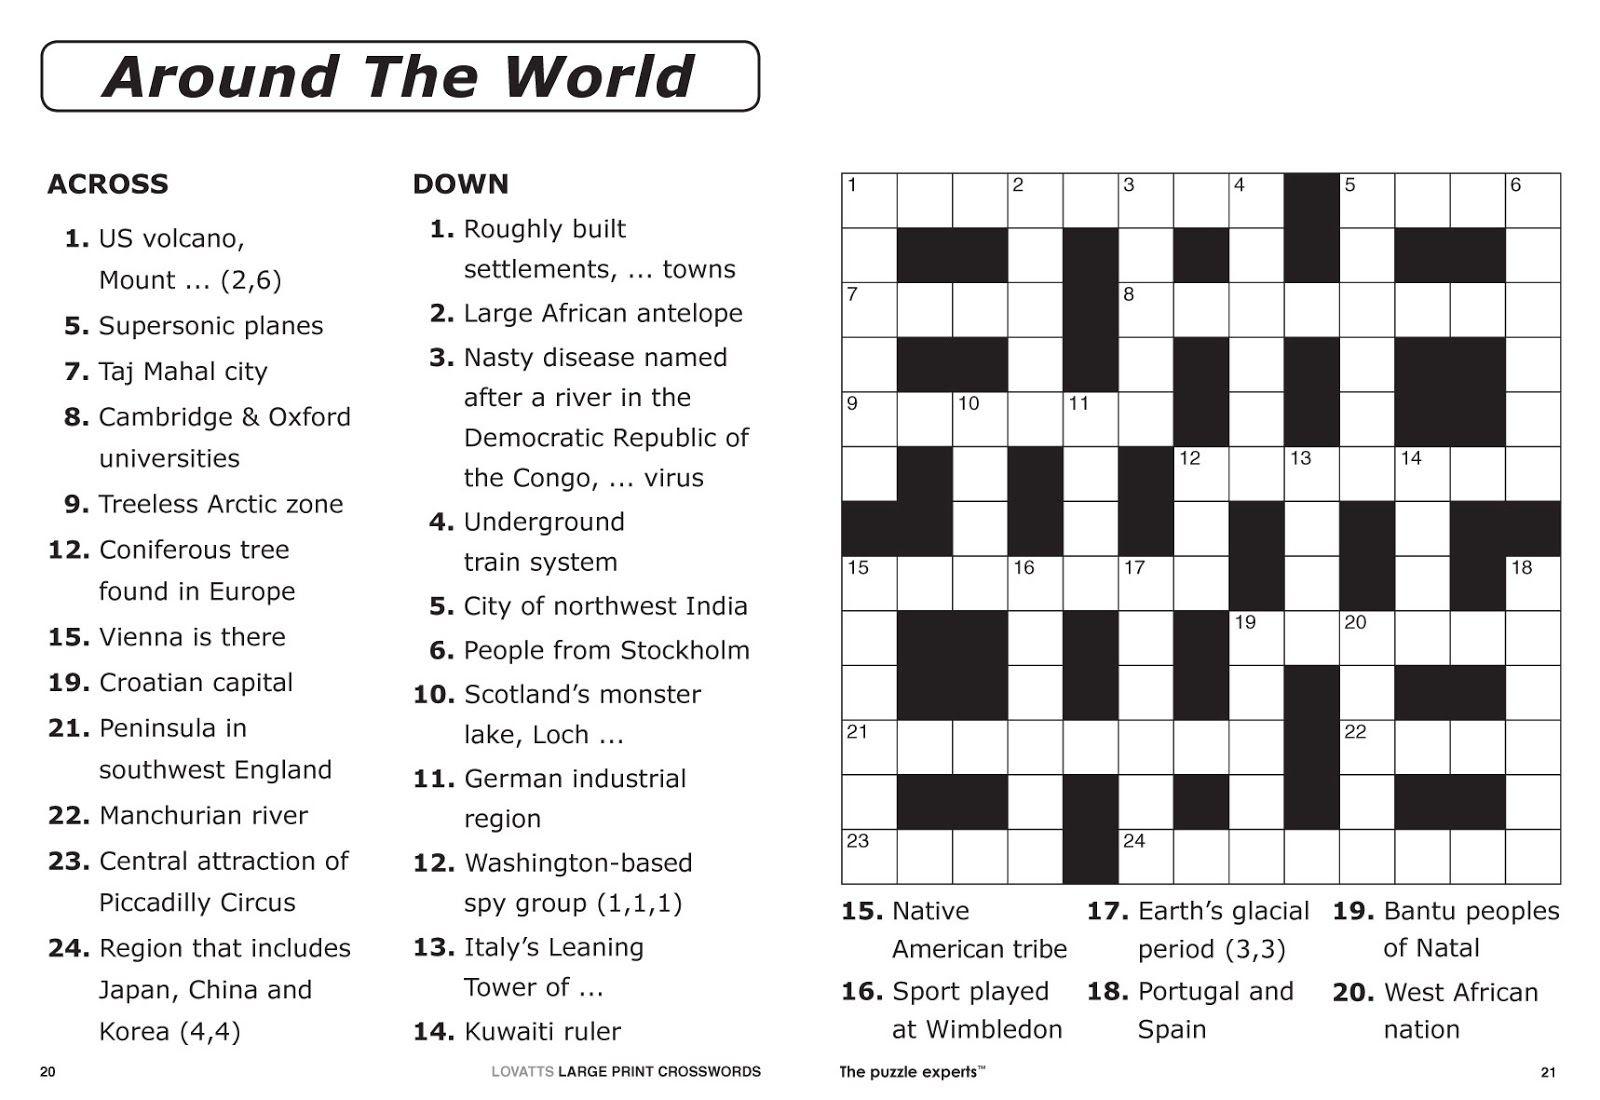 Free Printable Large Print Crossword Puzzles | M3U8 - Printable Crossword For 8 Year Olds